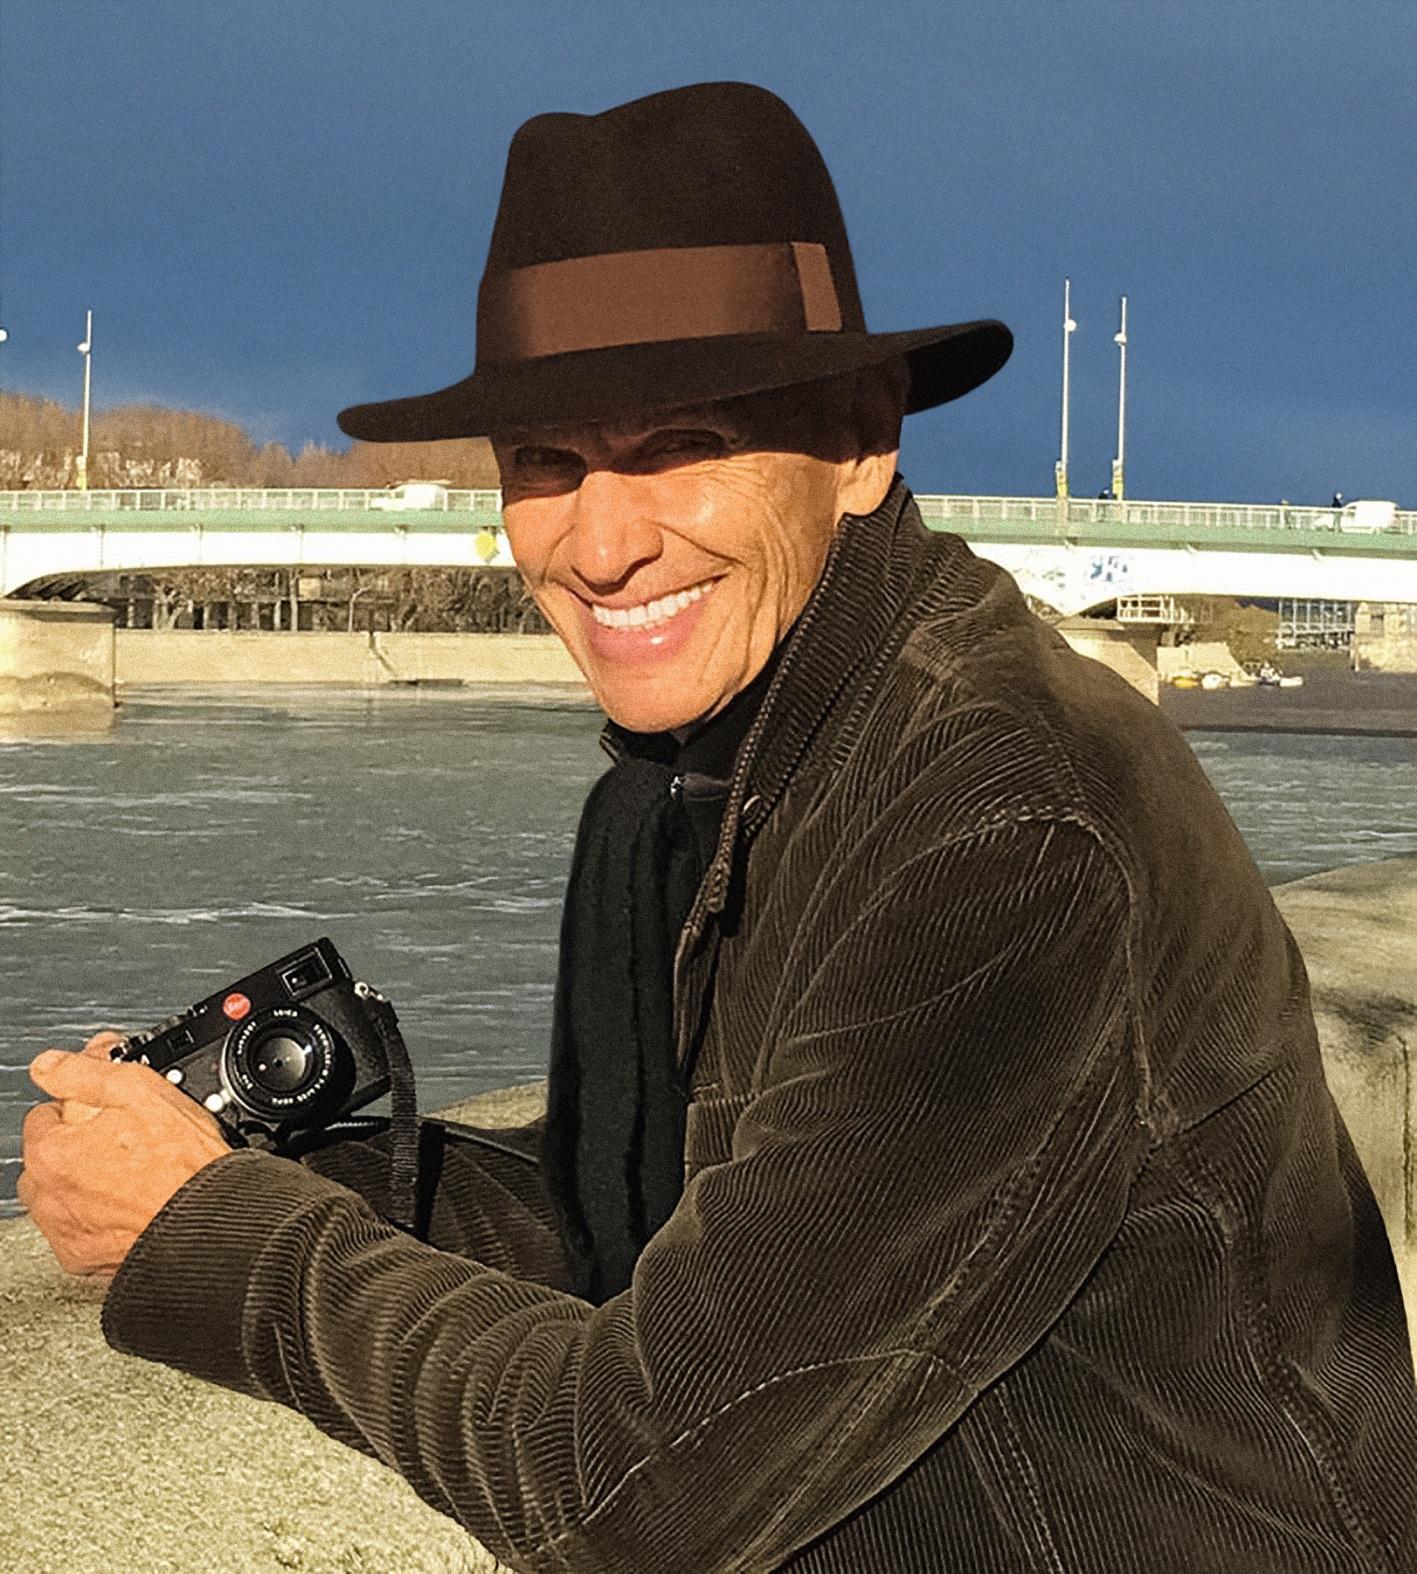 Joel Meyerowitz - PHOTOGRAPHERS WHO QUIT THEIR JOBS TO CHASE THEIR DREAMS